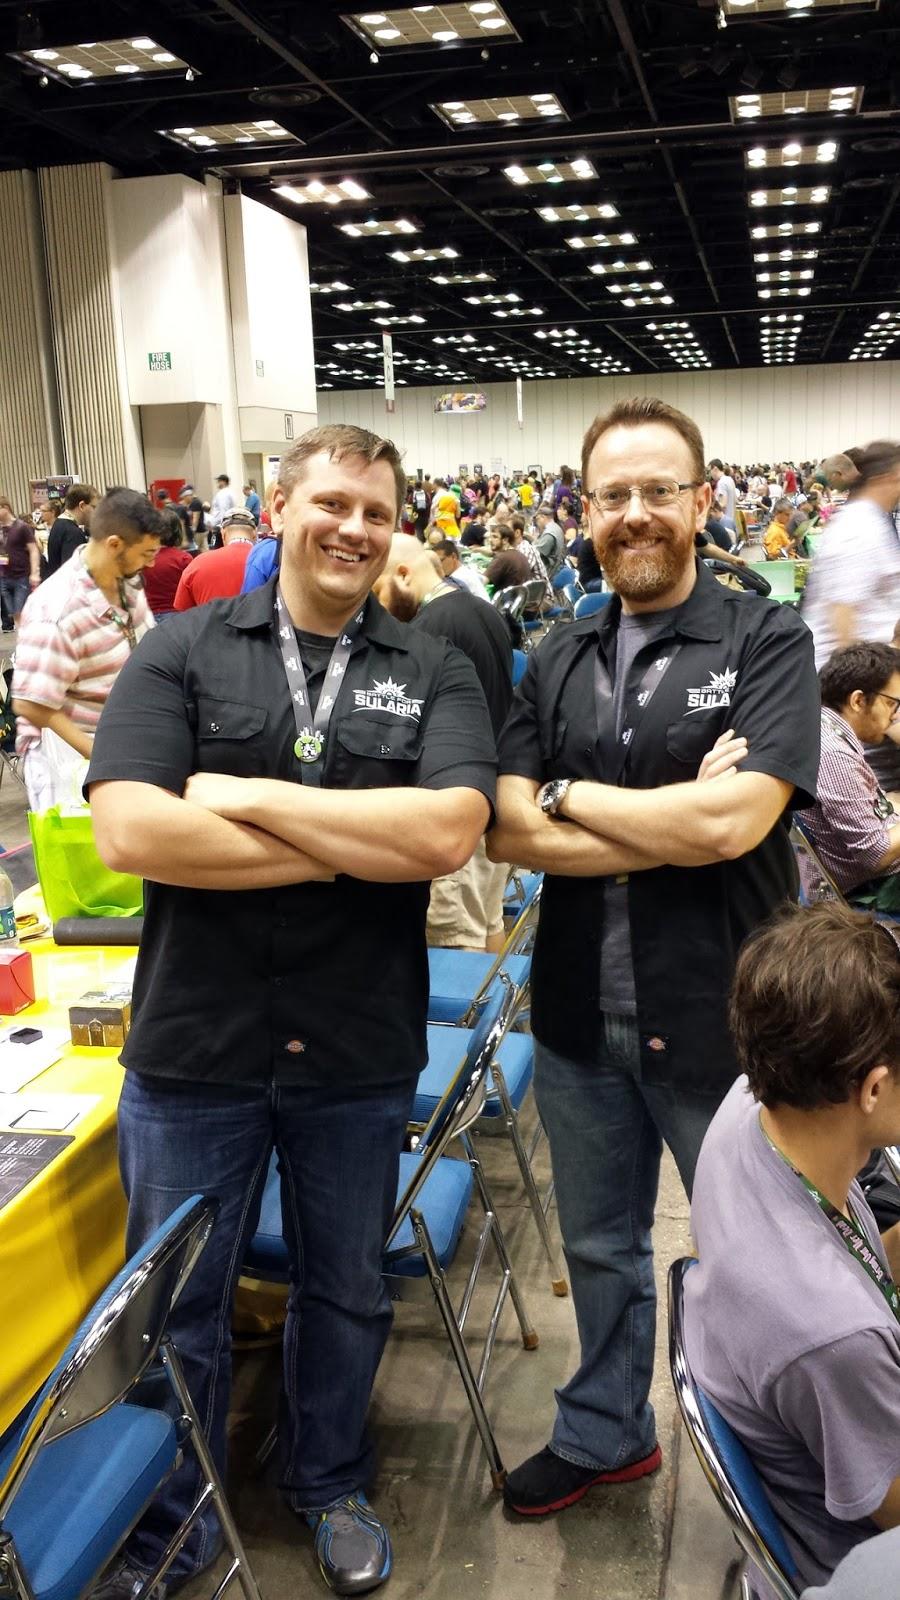 President Jesse Bergman and Vice-president John Kimmel